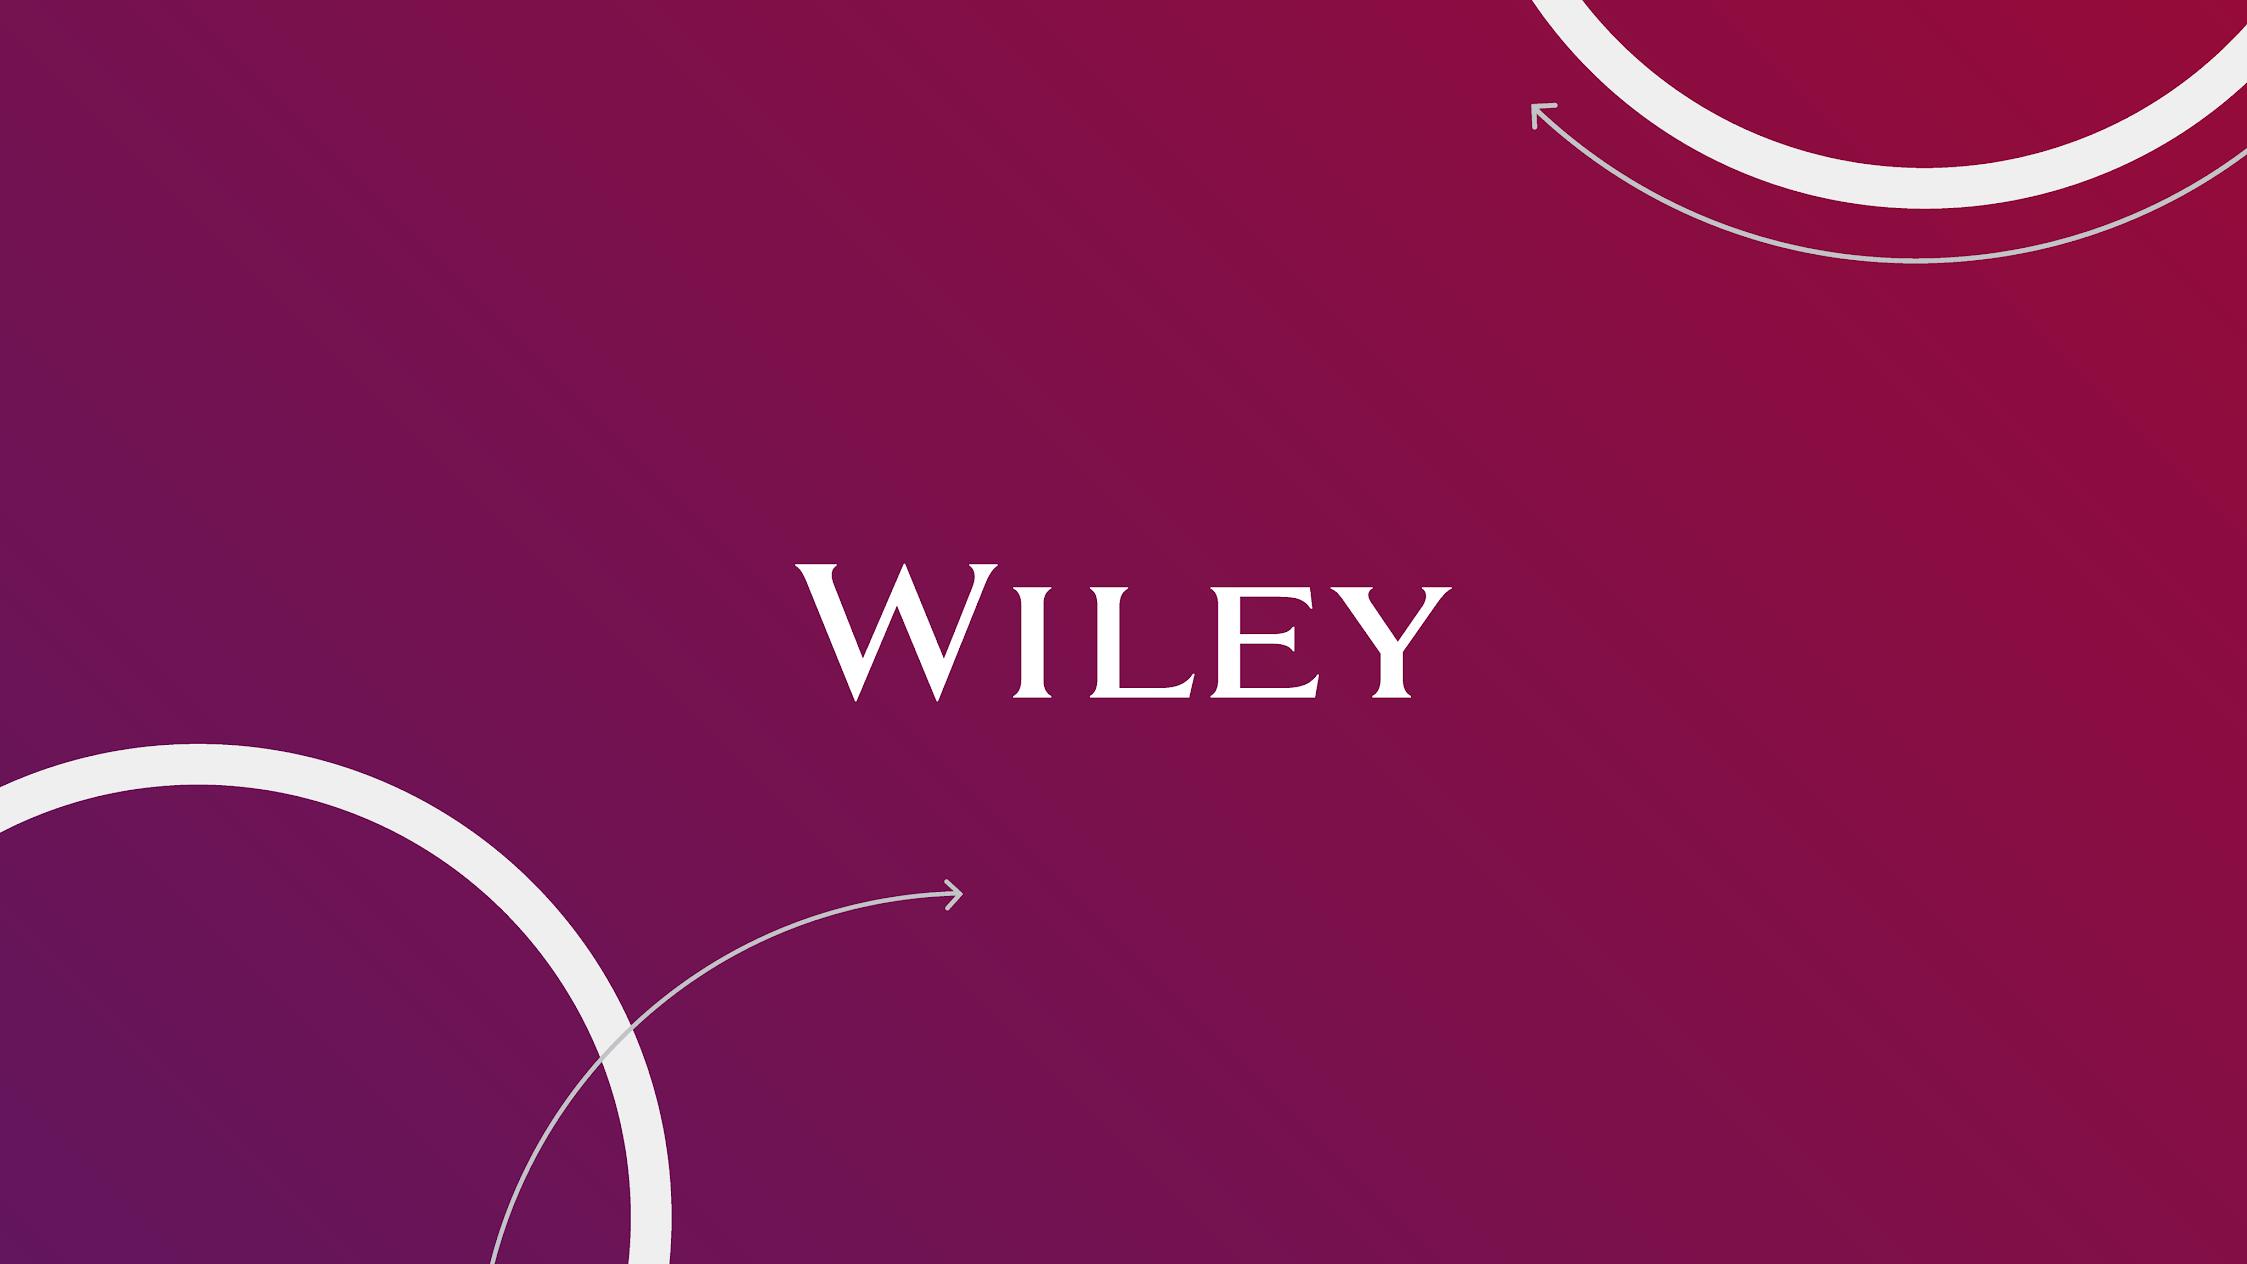 John Wiley & Sons, Inc.